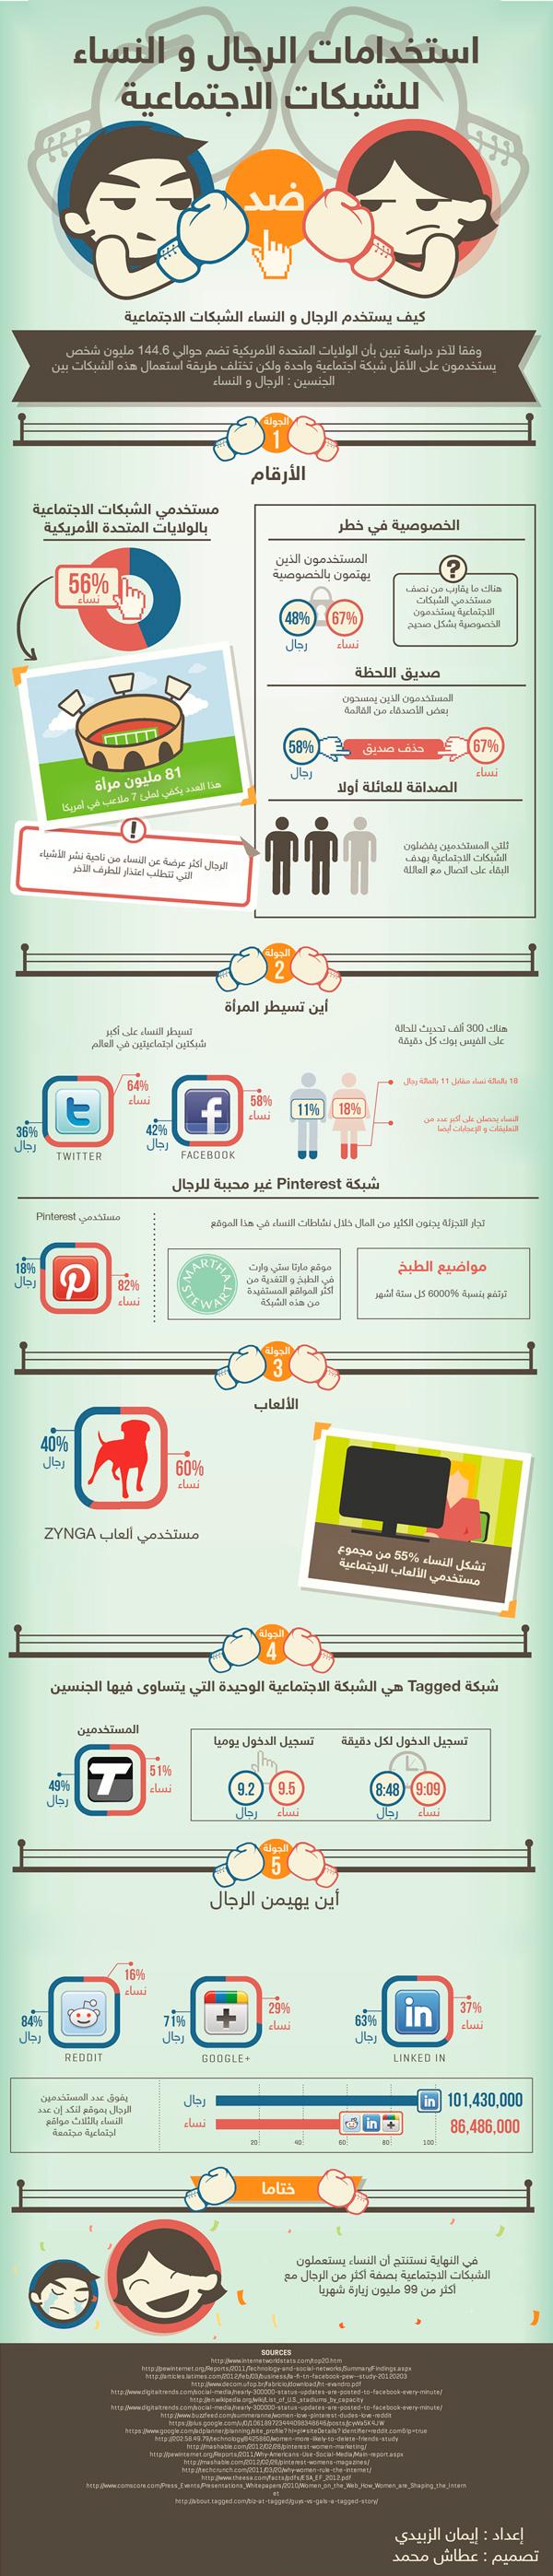 battle انفوجرافيك: استخدامات الرجال والنساء للشبكات الإجتماعية